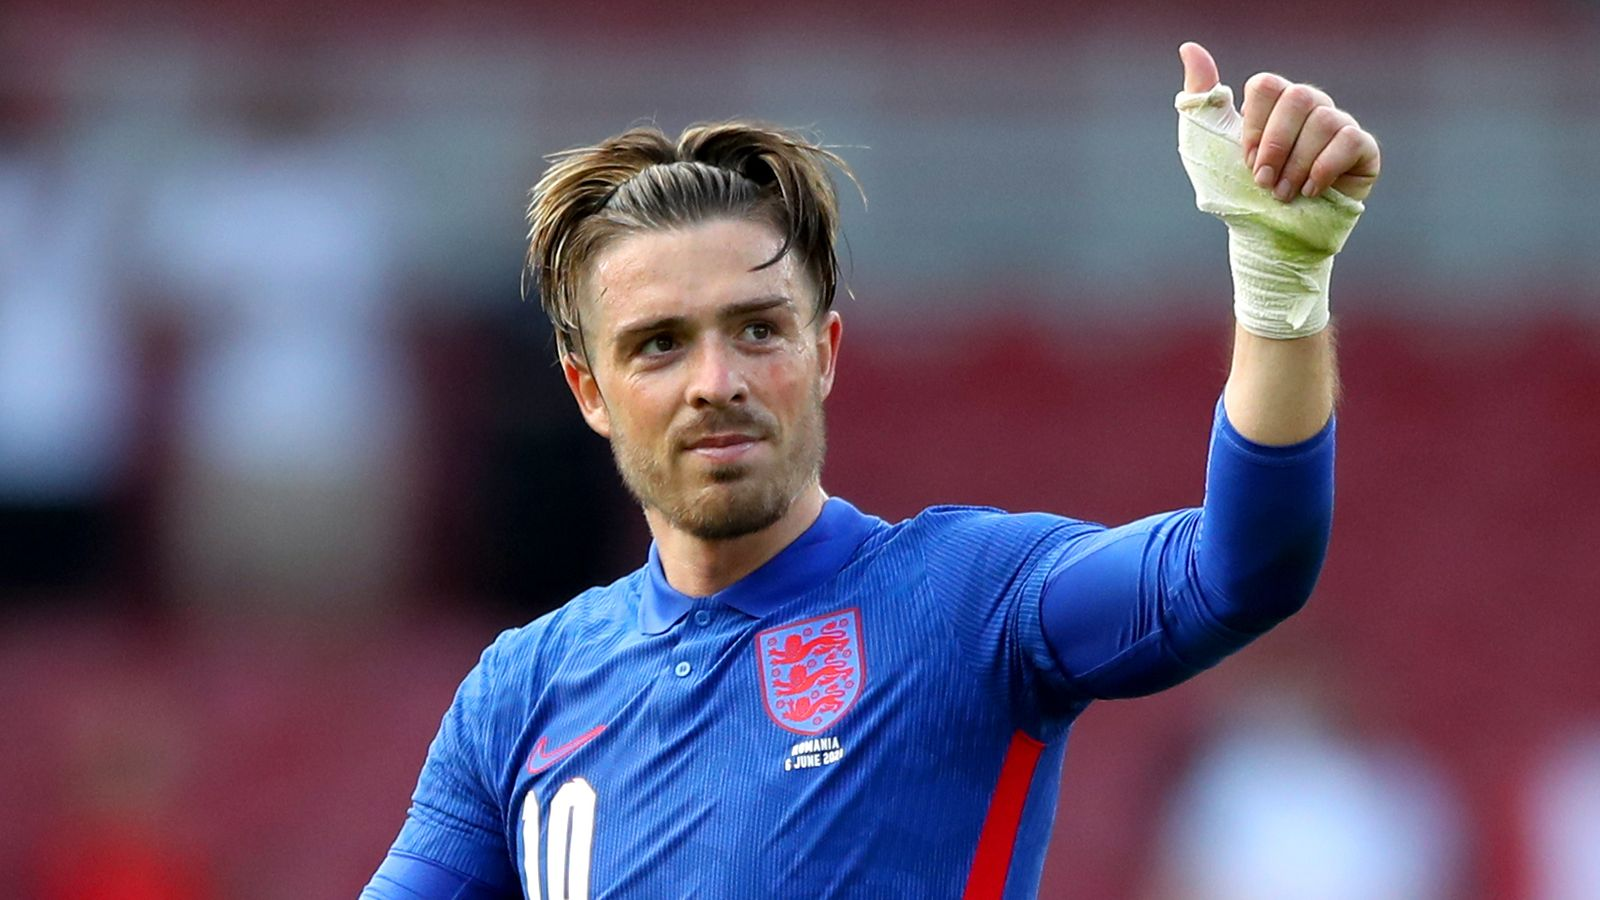 Jack Grealish: Aston Villa Negotiates Open Contract with England Star Amid  Manchester City Interest   Football news - Insider Voice